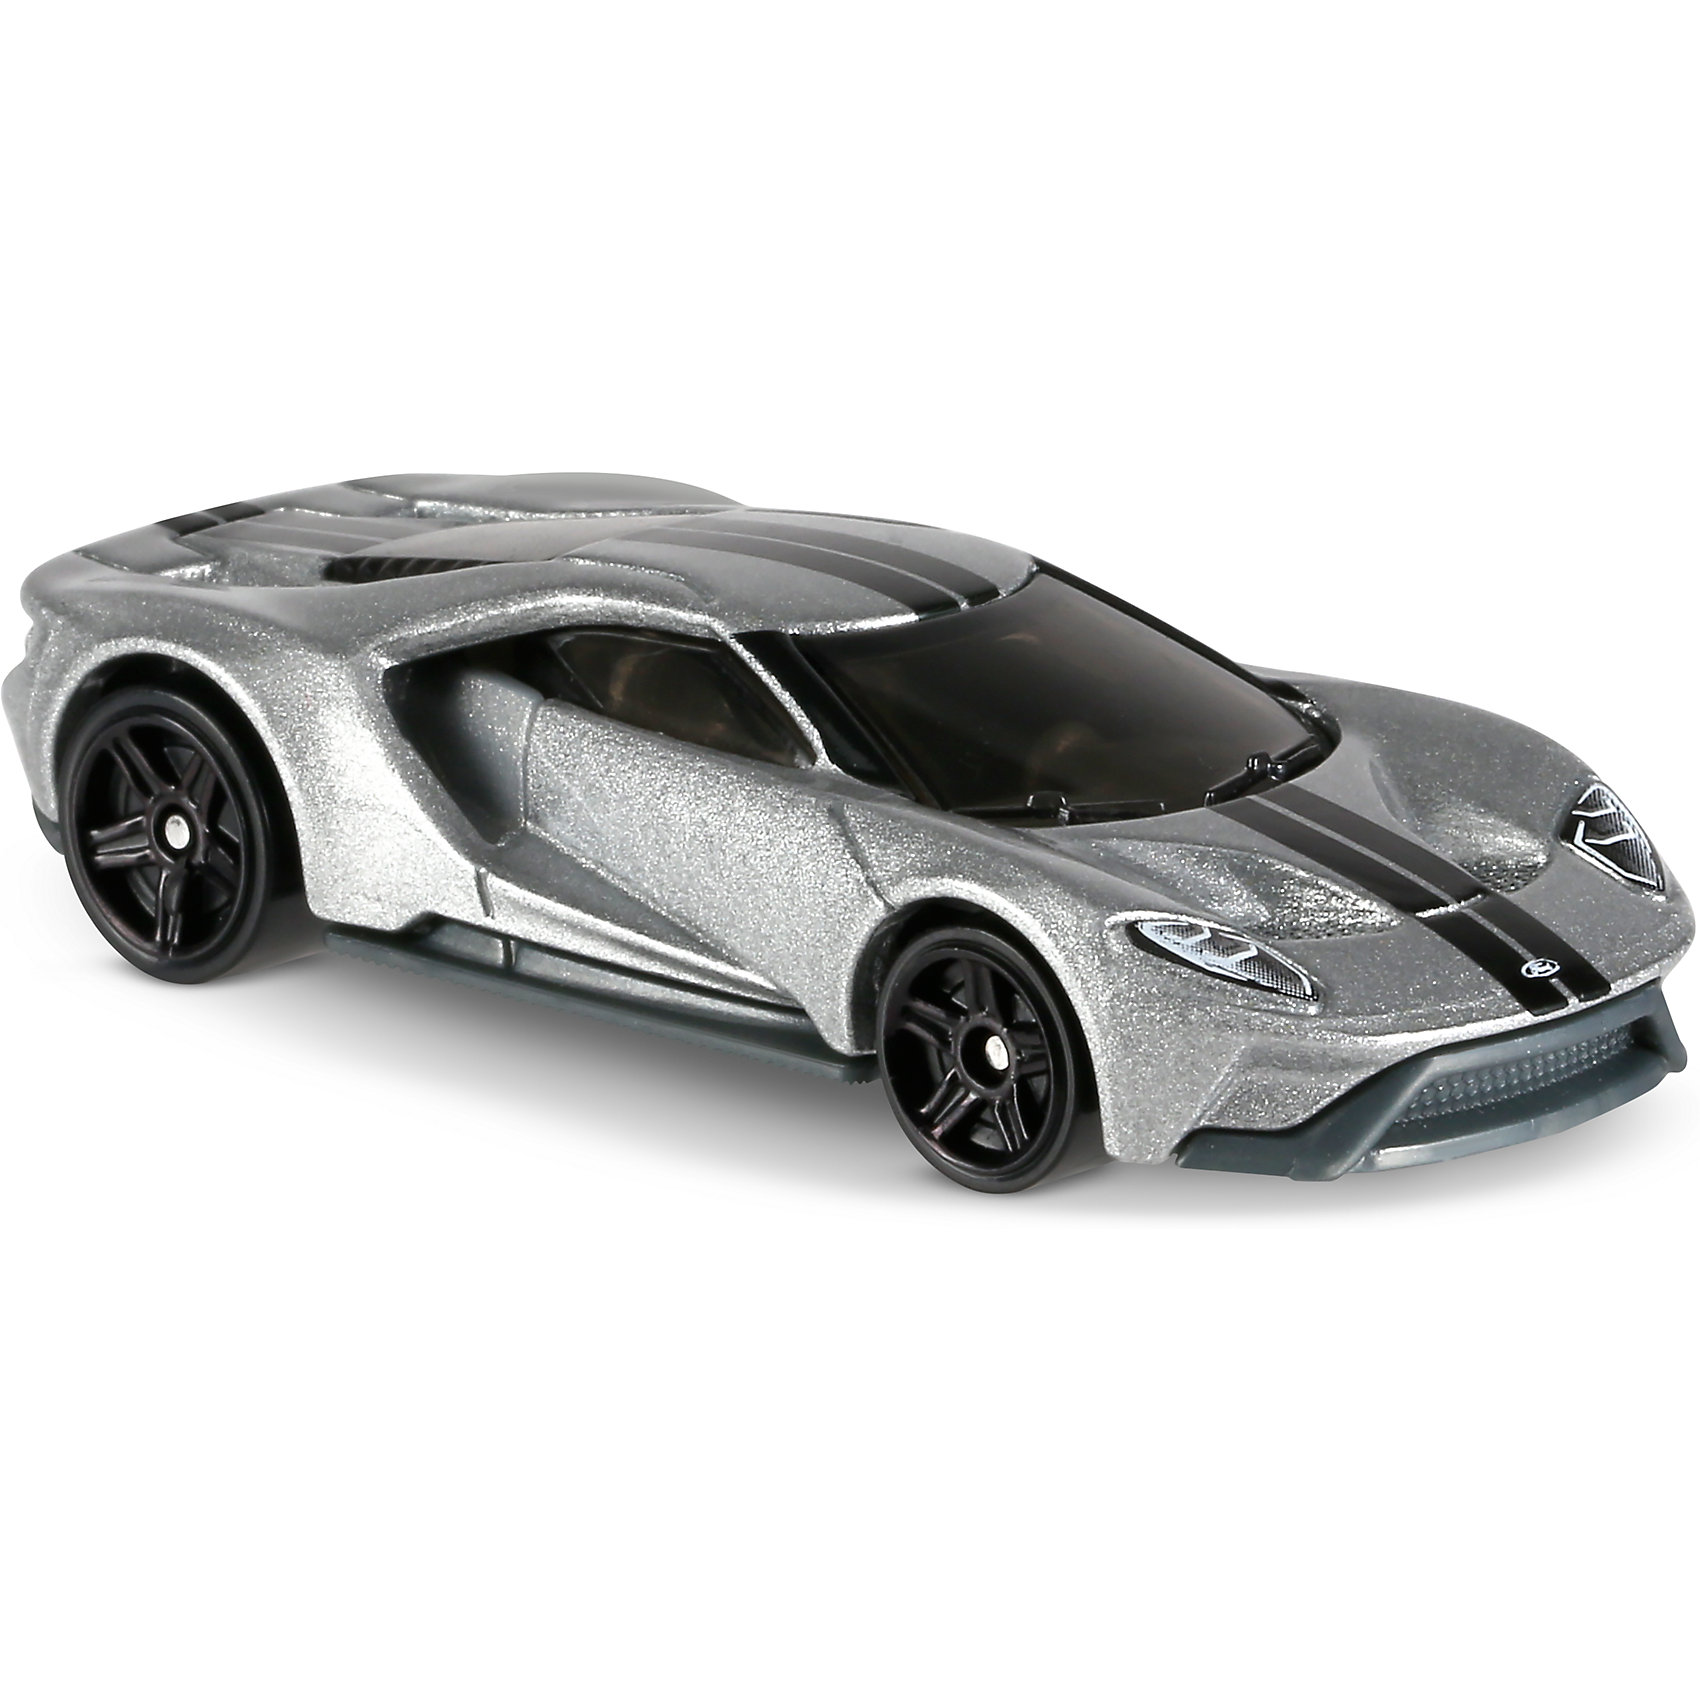 Базовая машинка Hot Wheels, 17 Ford GTМашинки<br><br><br>Ширина мм: 110<br>Глубина мм: 45<br>Высота мм: 110<br>Вес г: 30<br>Возраст от месяцев: 36<br>Возраст до месяцев: 96<br>Пол: Мужской<br>Возраст: Детский<br>SKU: 7142078